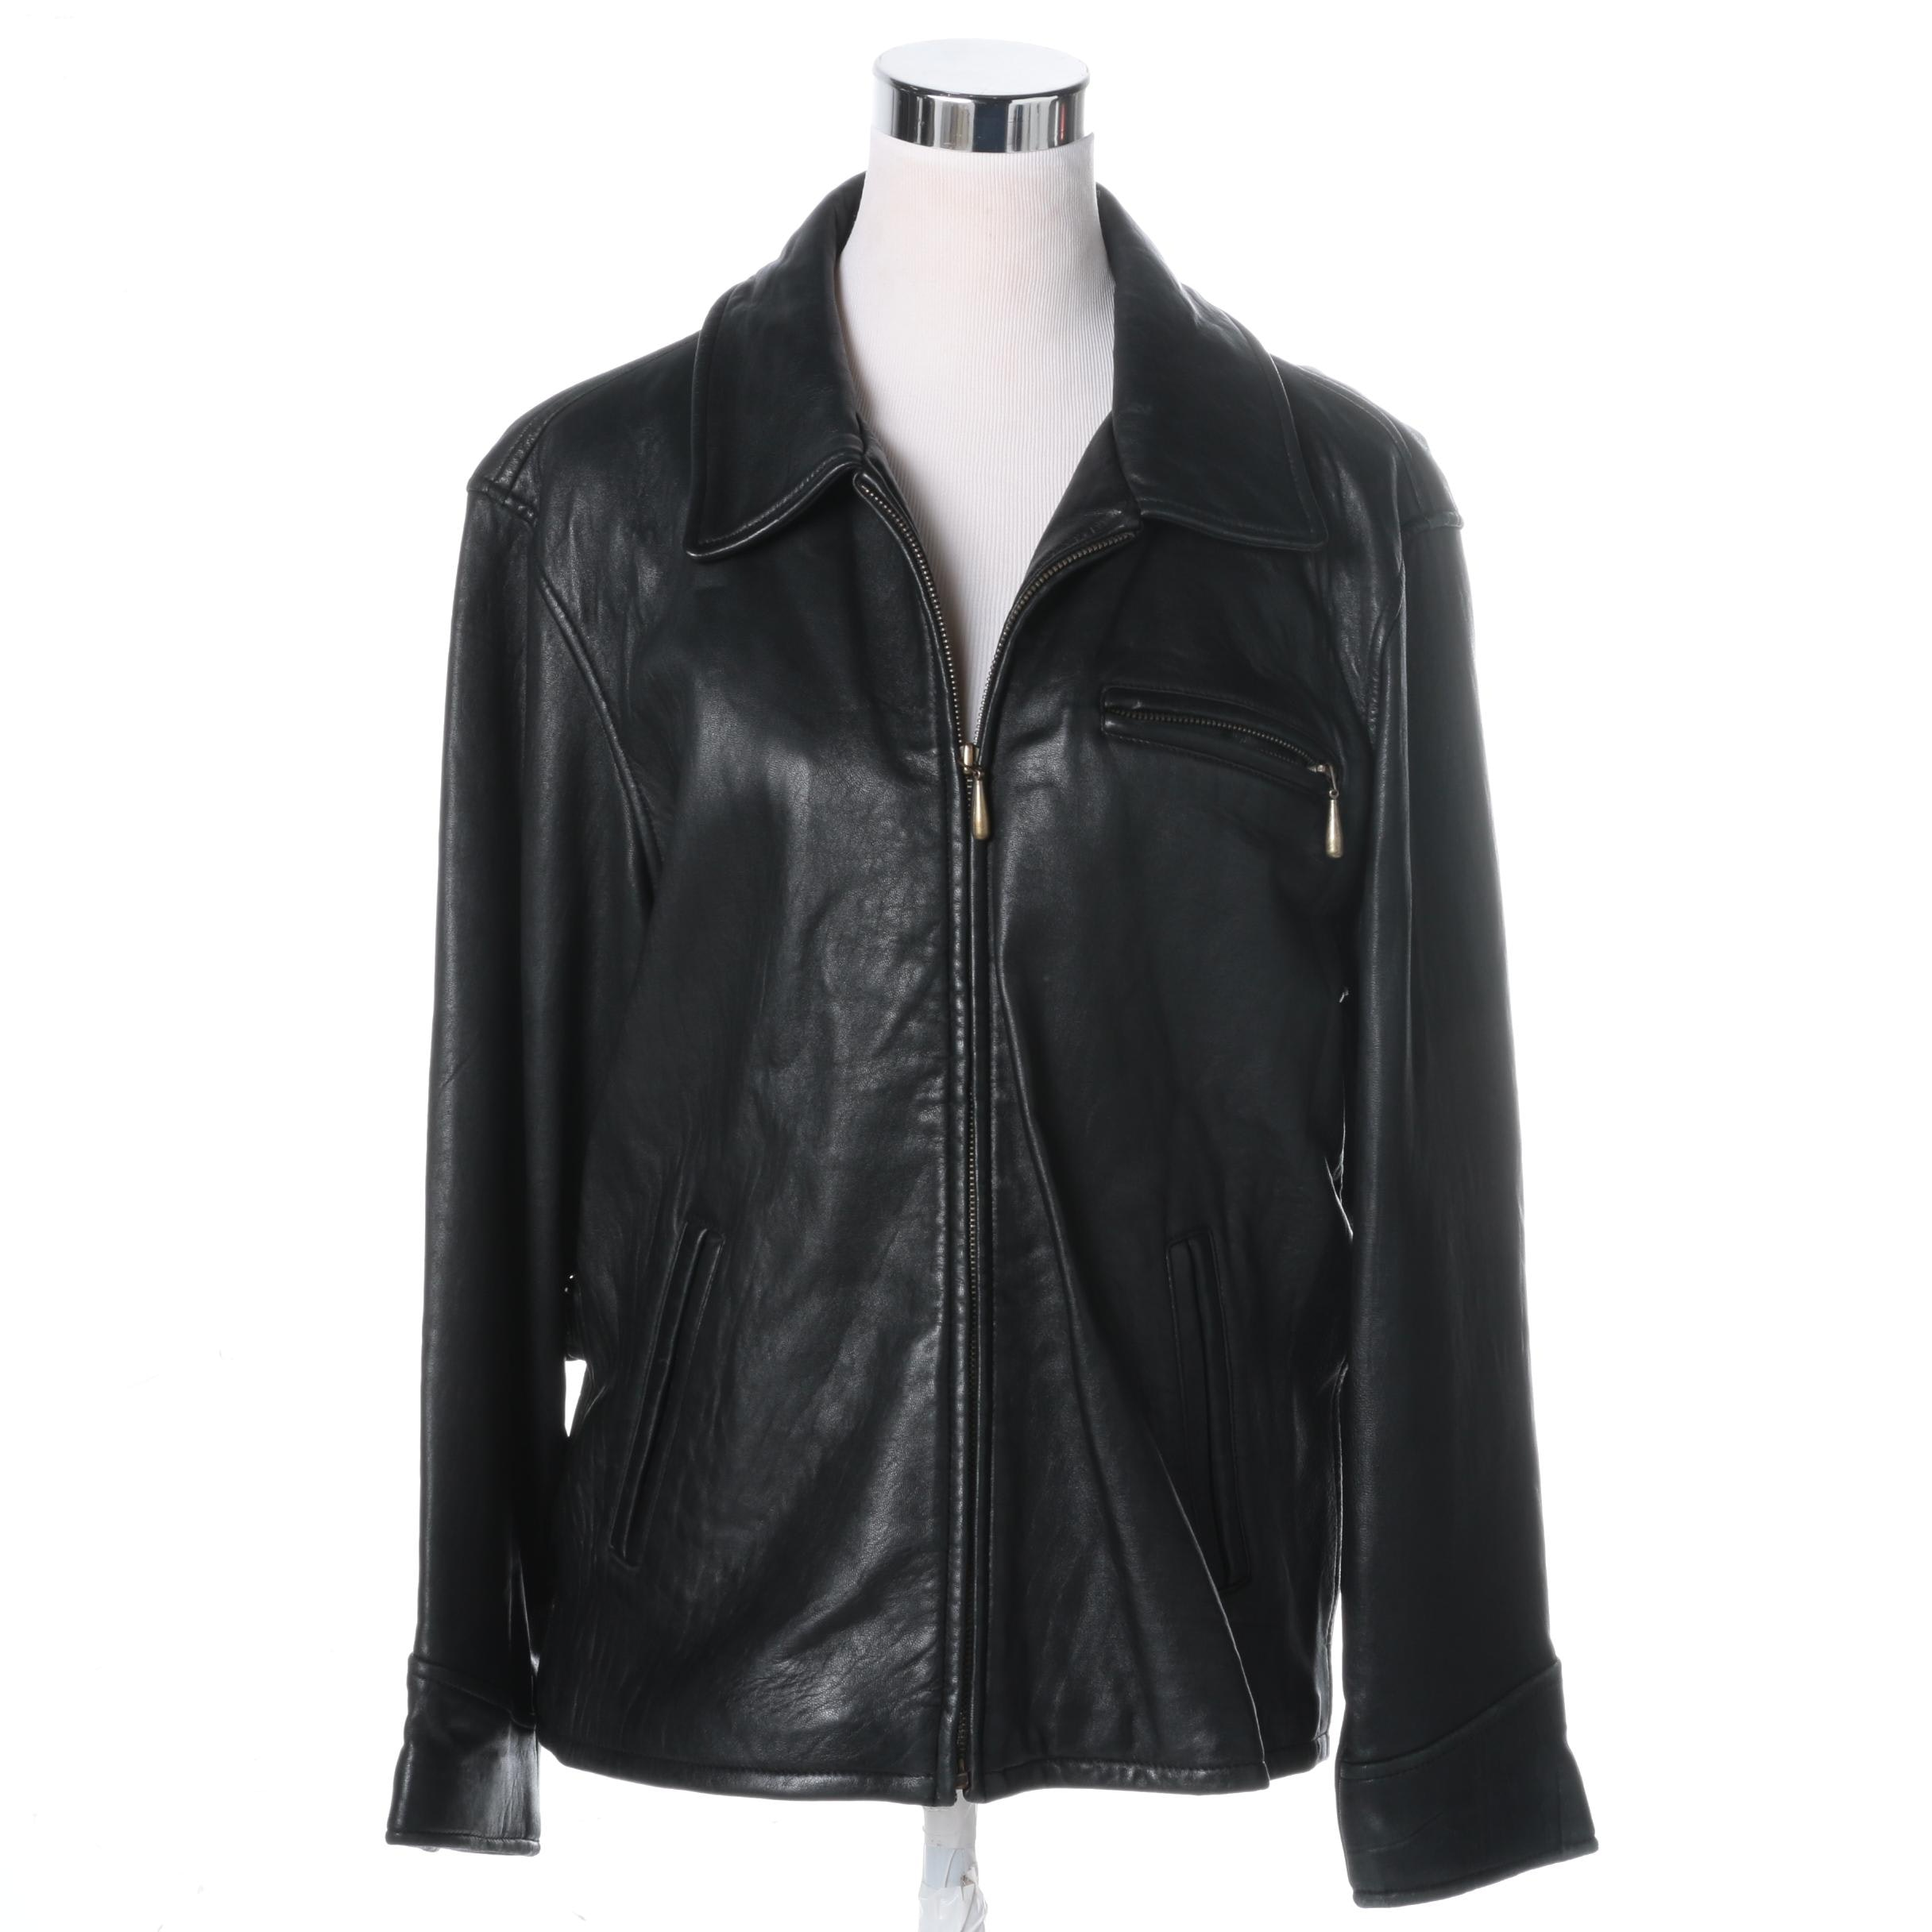 Jacqueline Ferrar Black Leather Jacket